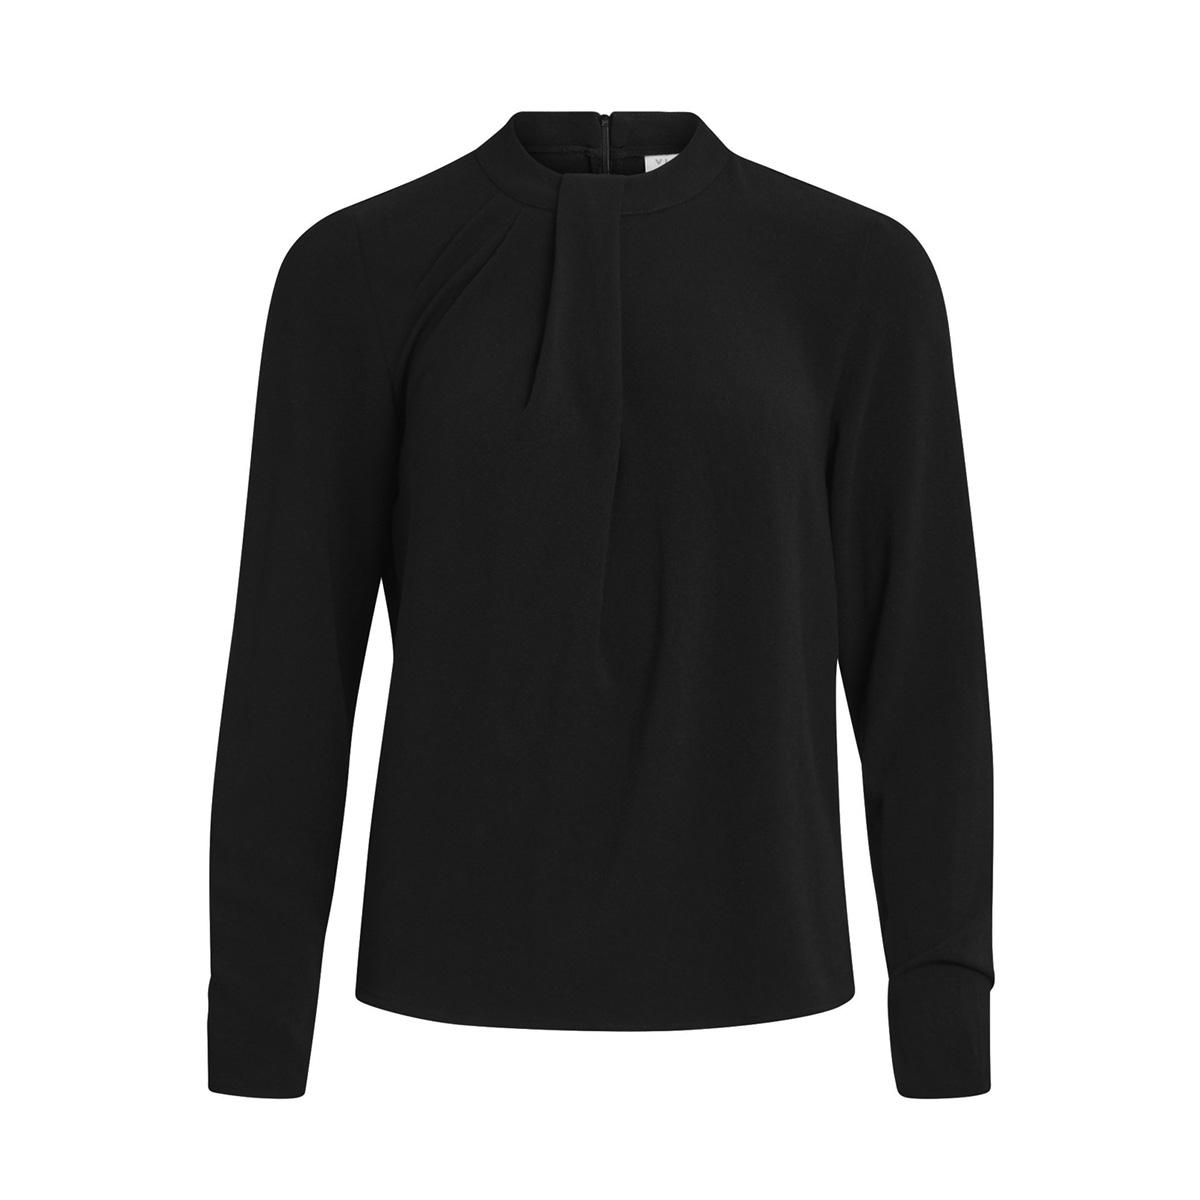 vicallie l/s drape top/gv 14043866 vila blouse black